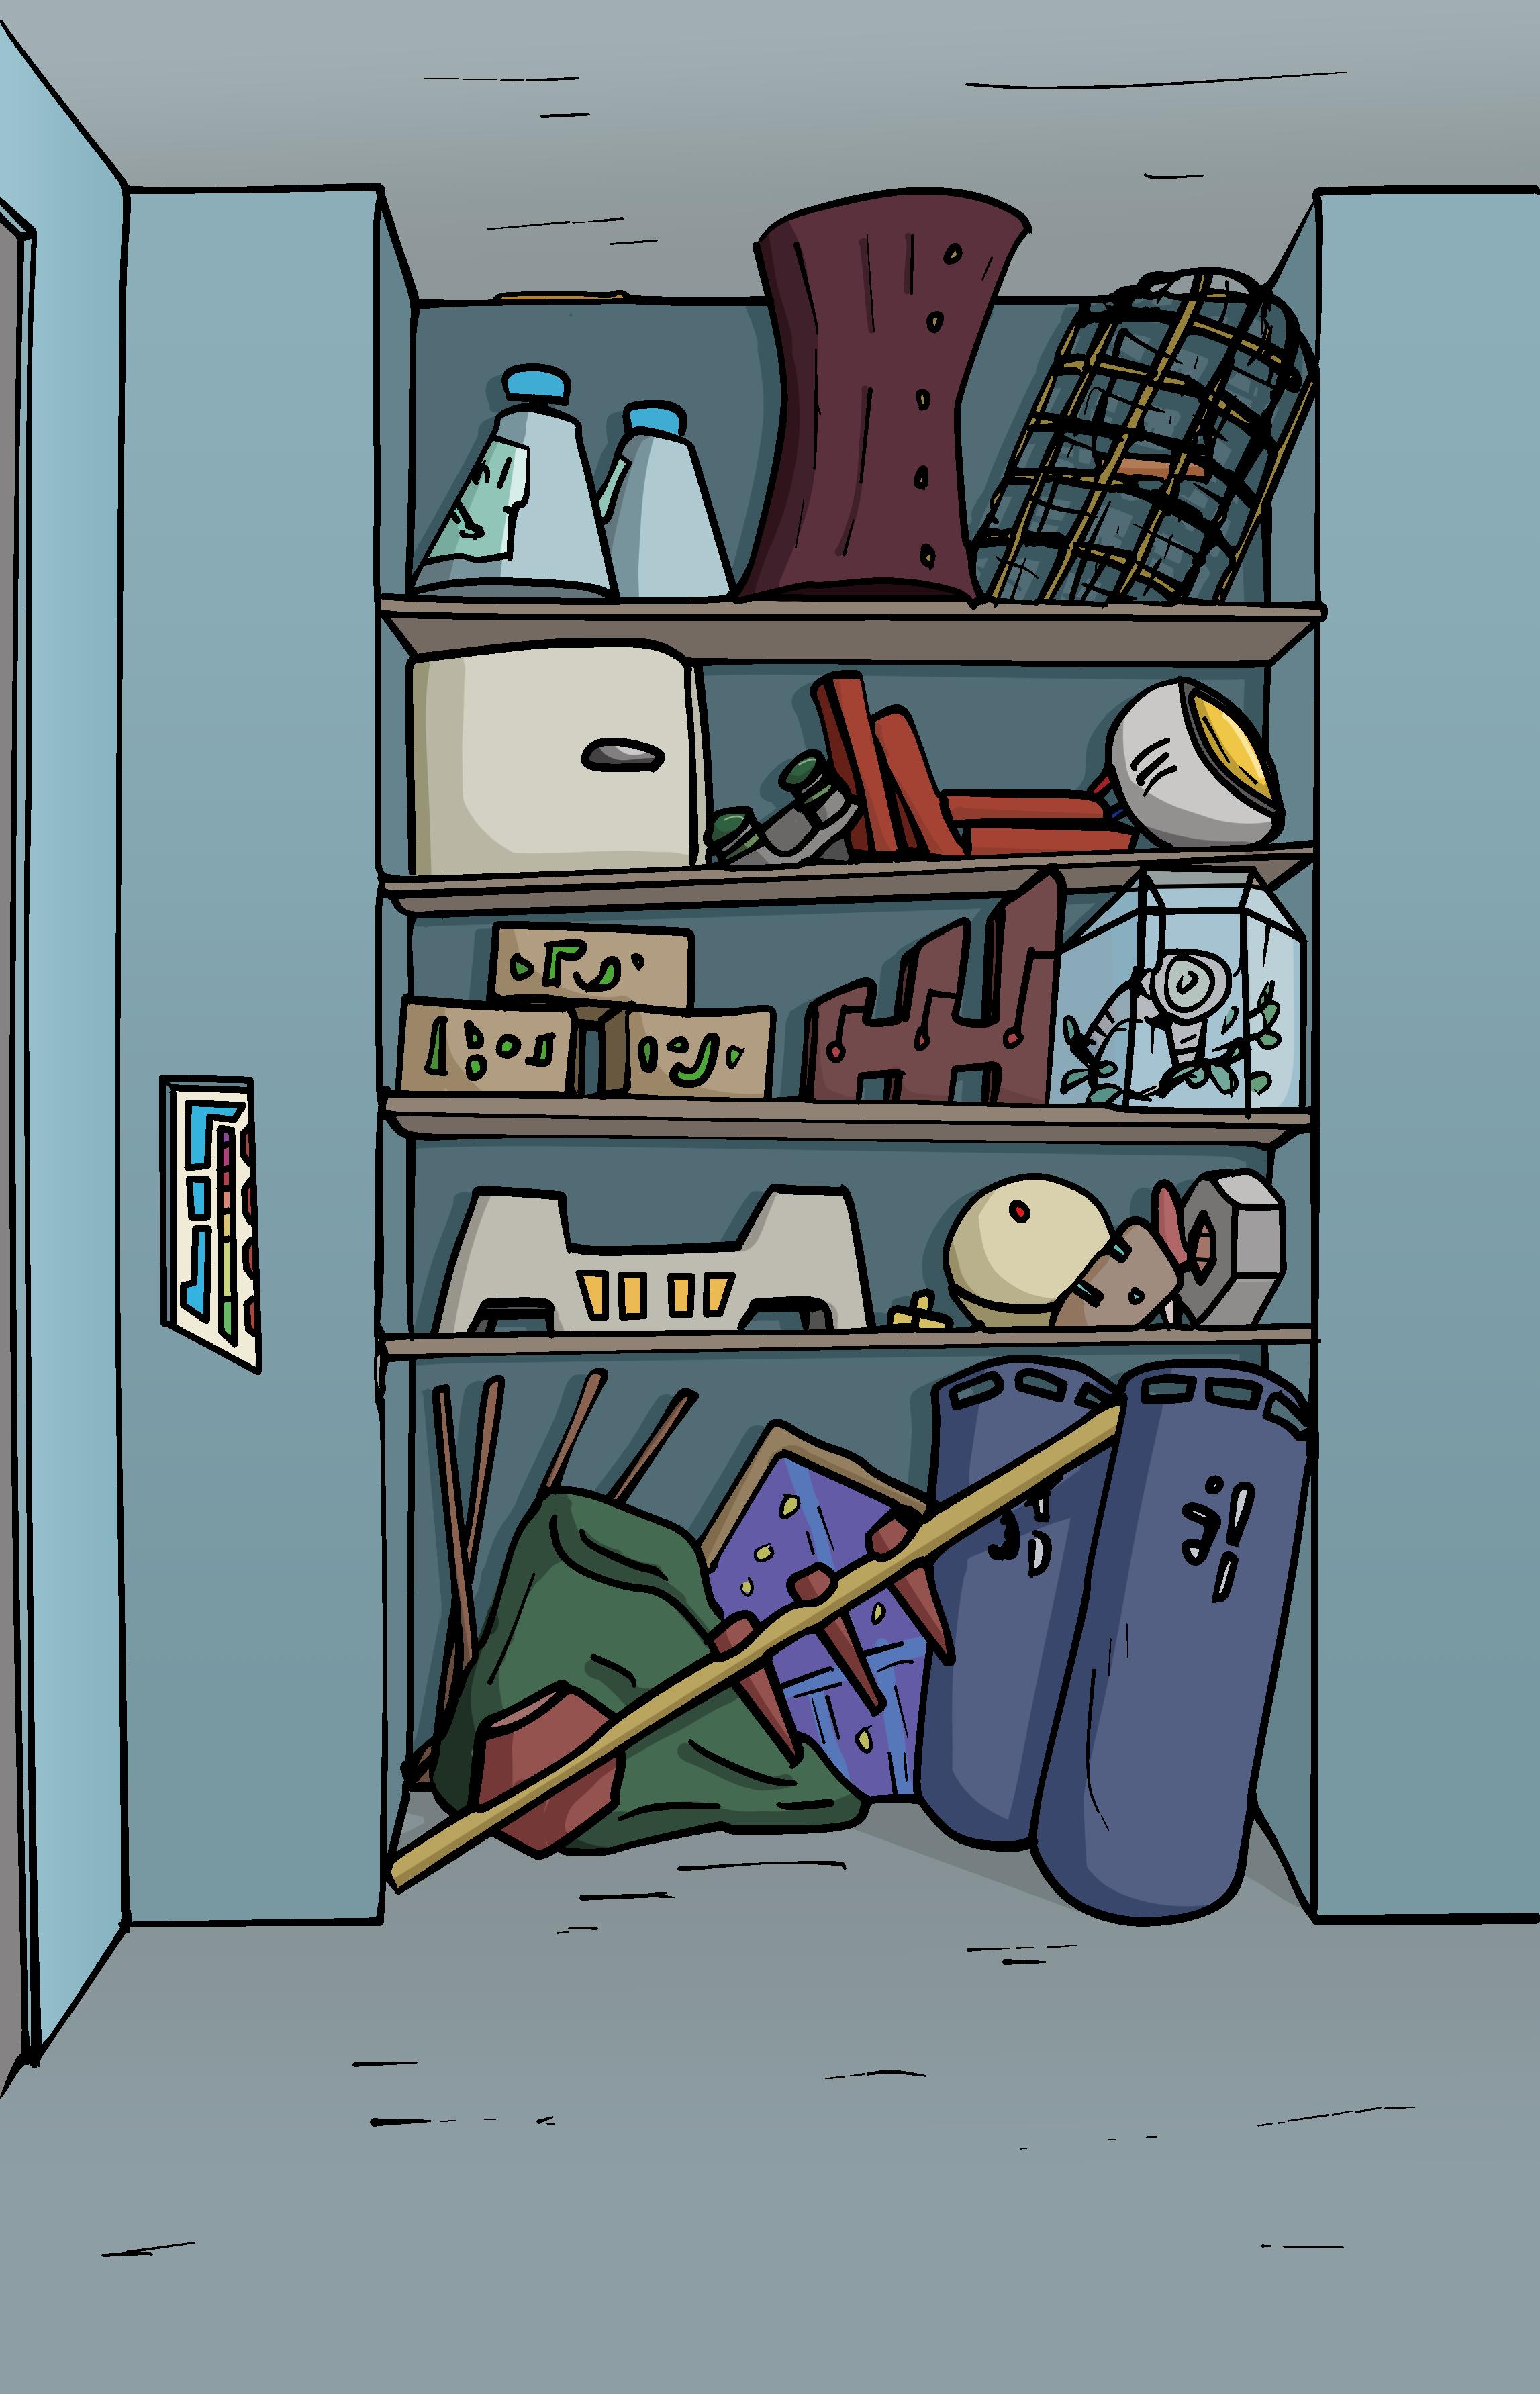 The bunker cupboard, a cartoon style cupboard full of random indistinguishable items